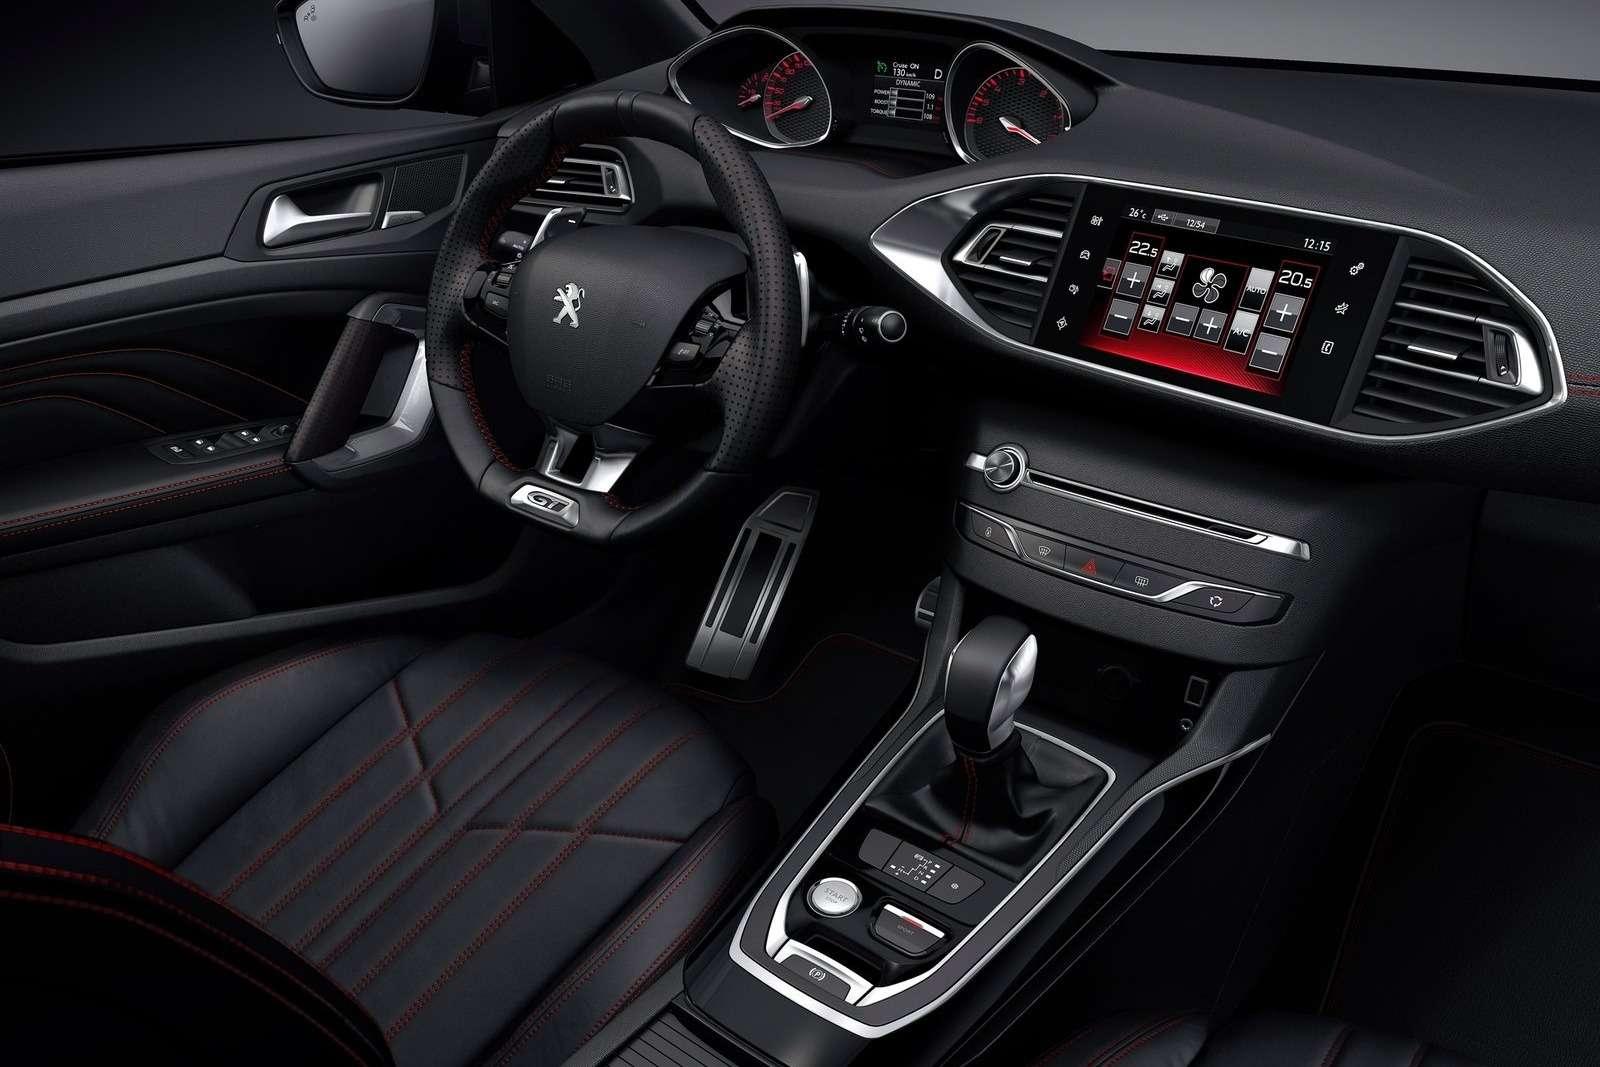 Peugeot-308_GT_2015_1600x1200_wallpaper_0c